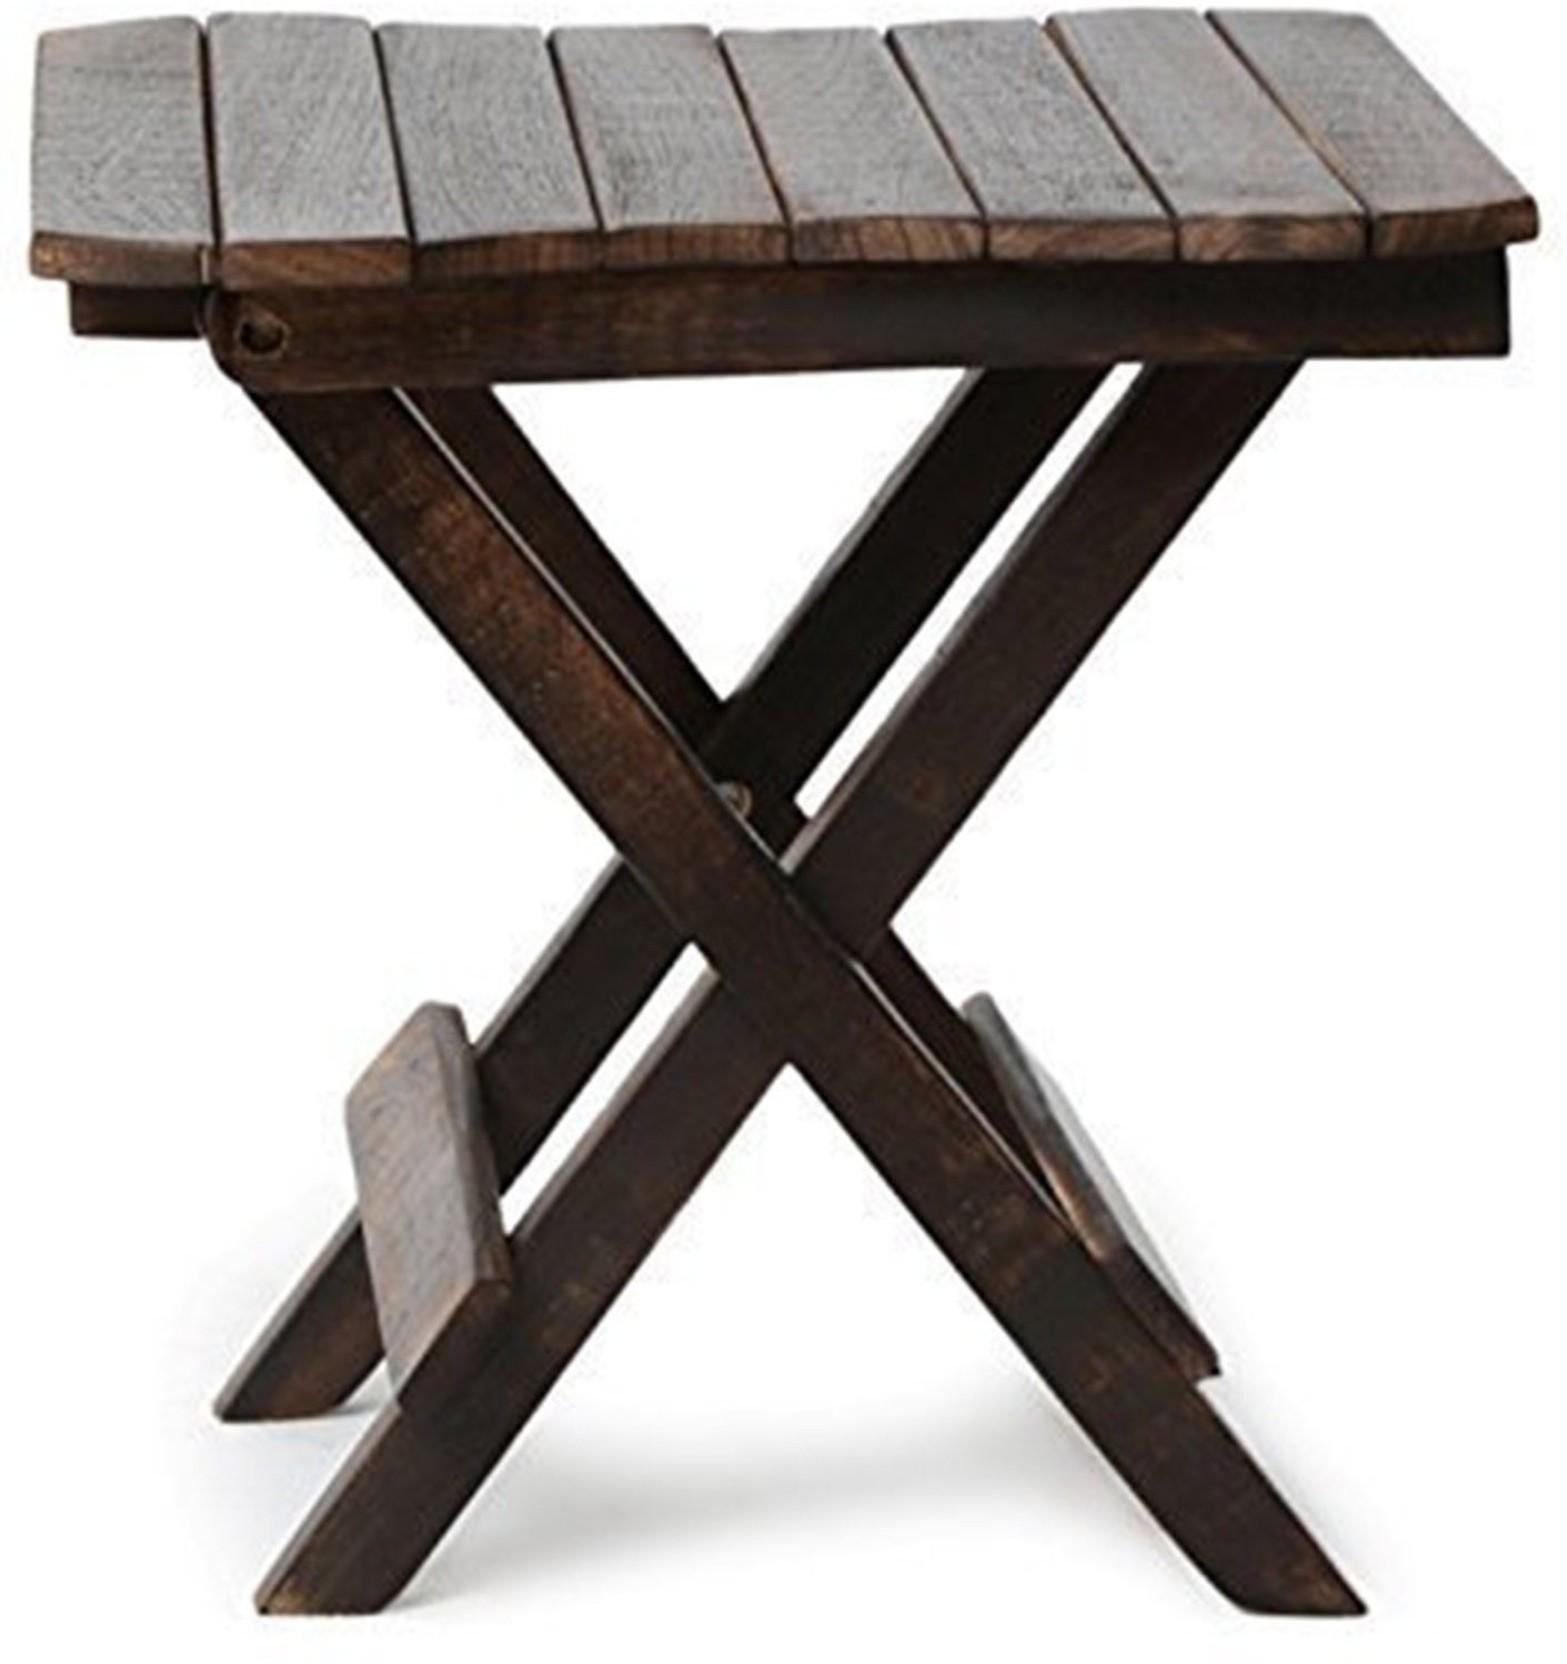 Trustshoppee Handmade Wooden Handicraft Folding Coffee Table